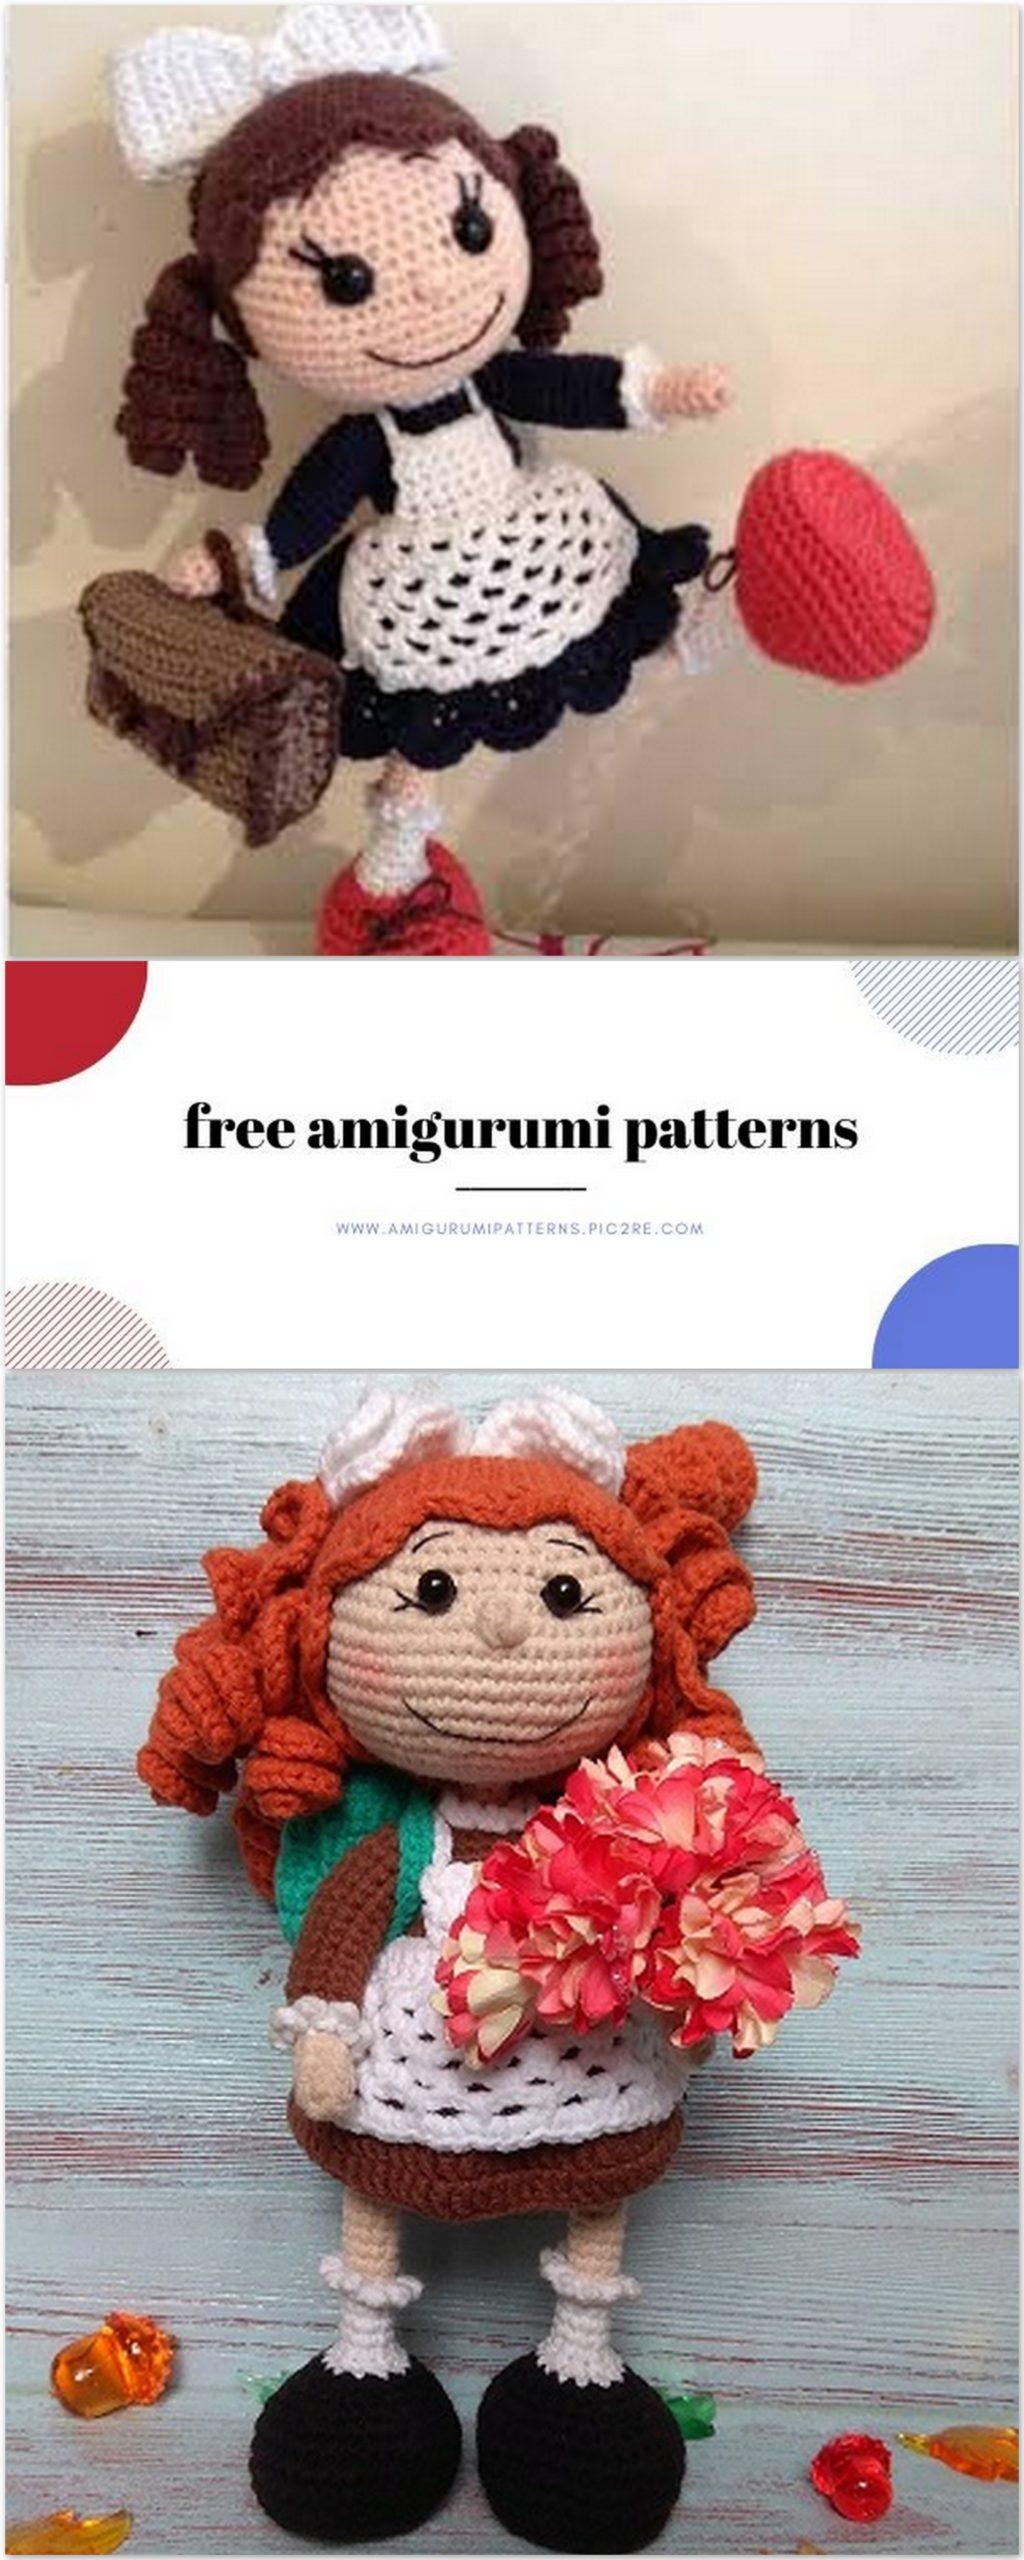 Amigurumi Patterns Tutorials | 2560x1024